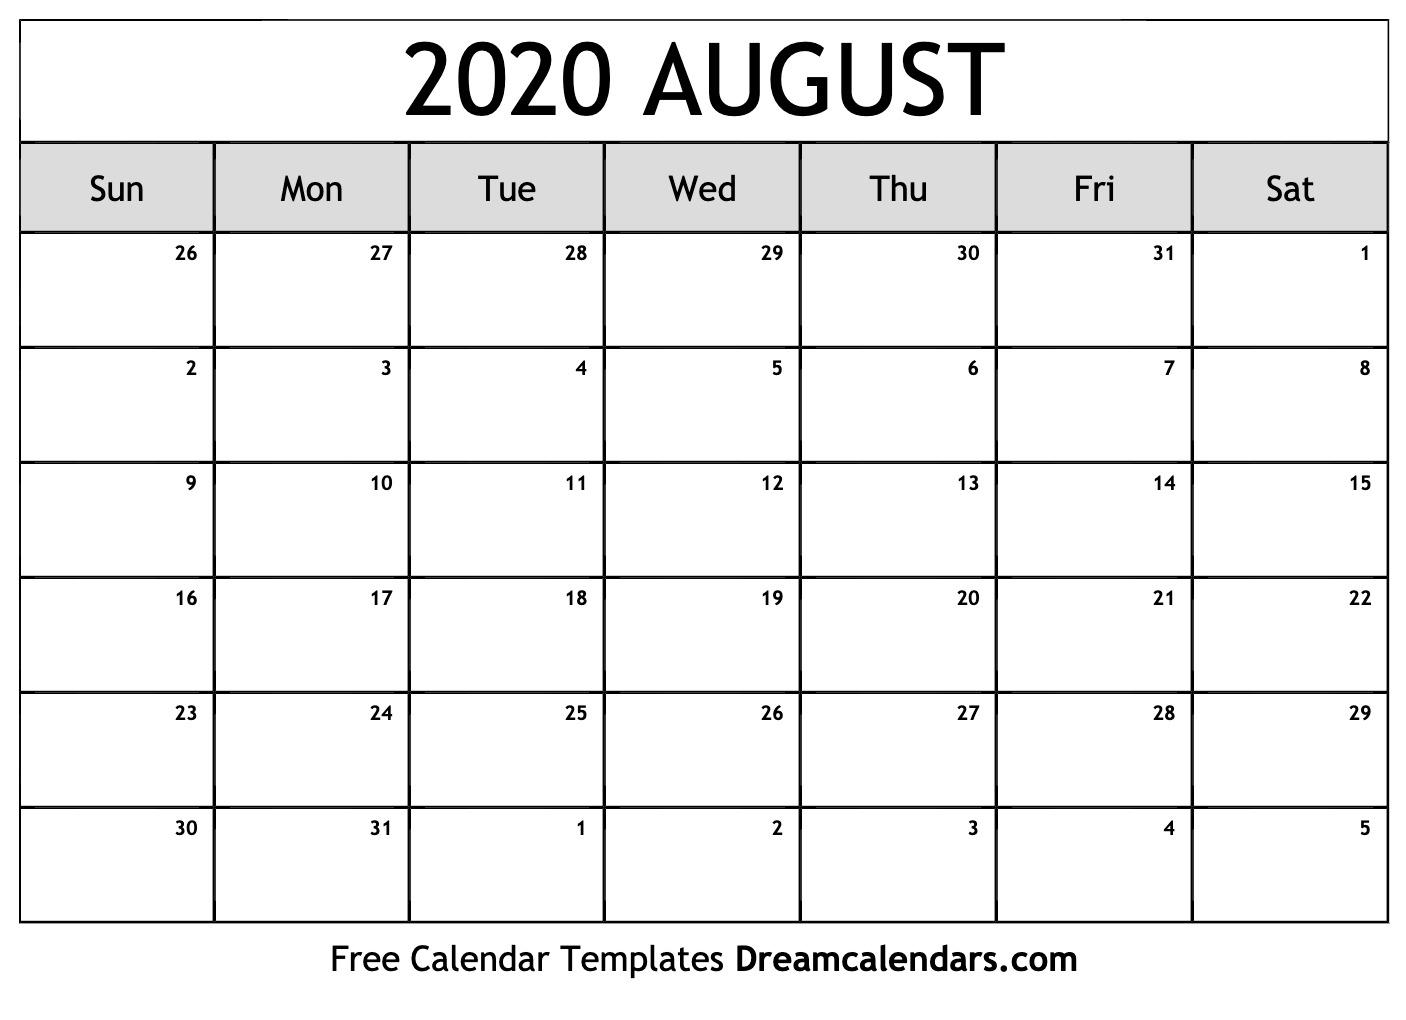 Free August 2020 Printable Calendar | Dream Calendars